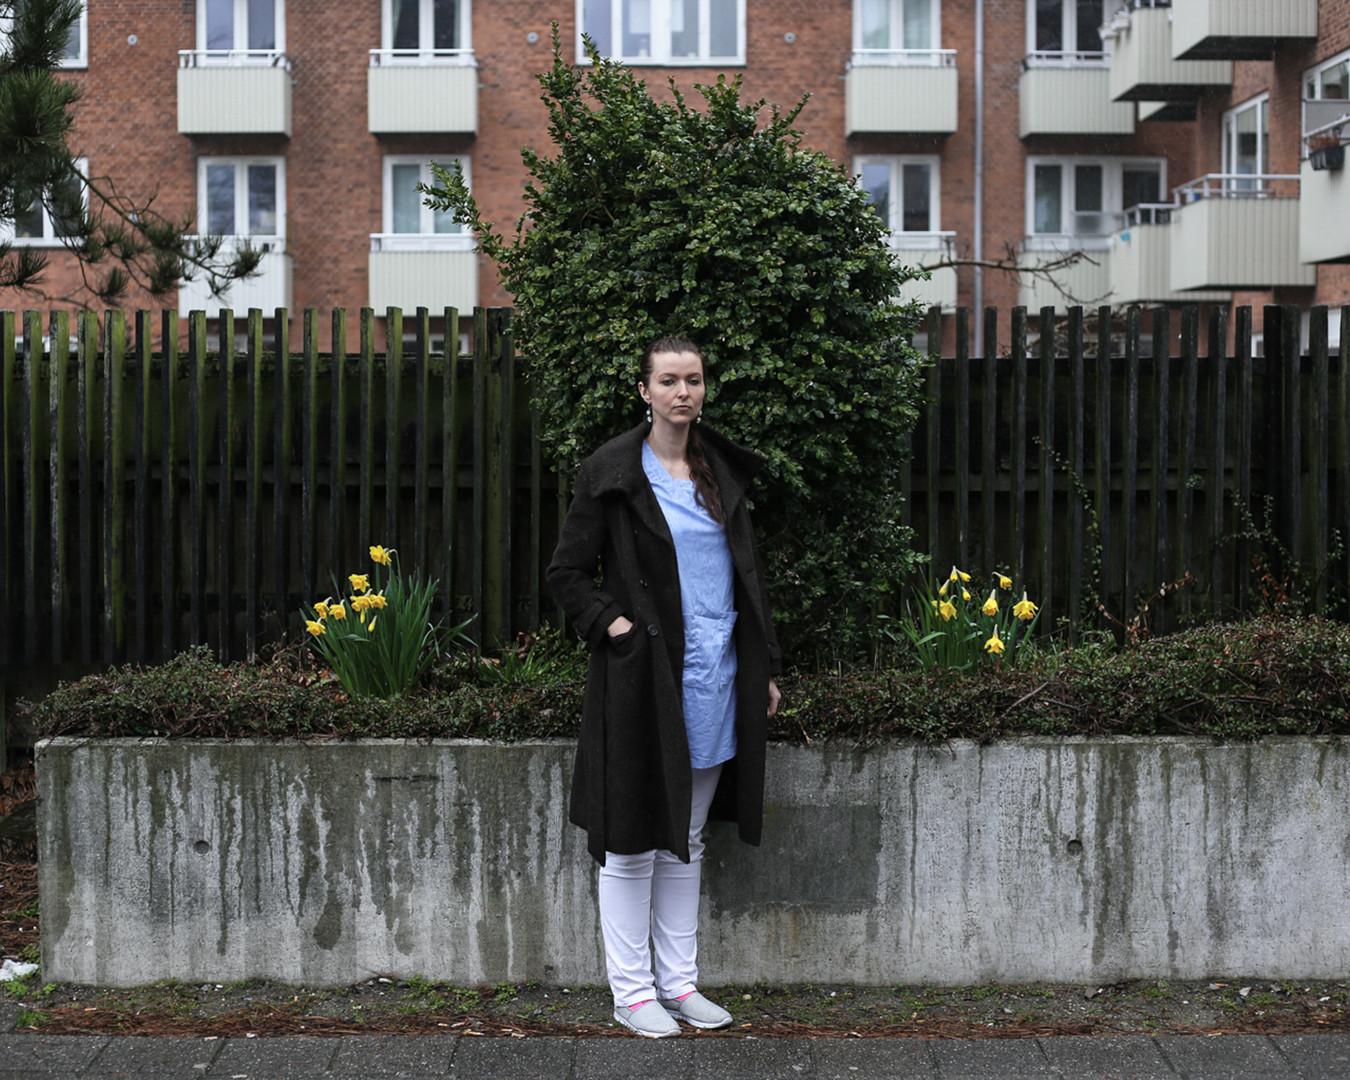 Ilona, 34, dentist